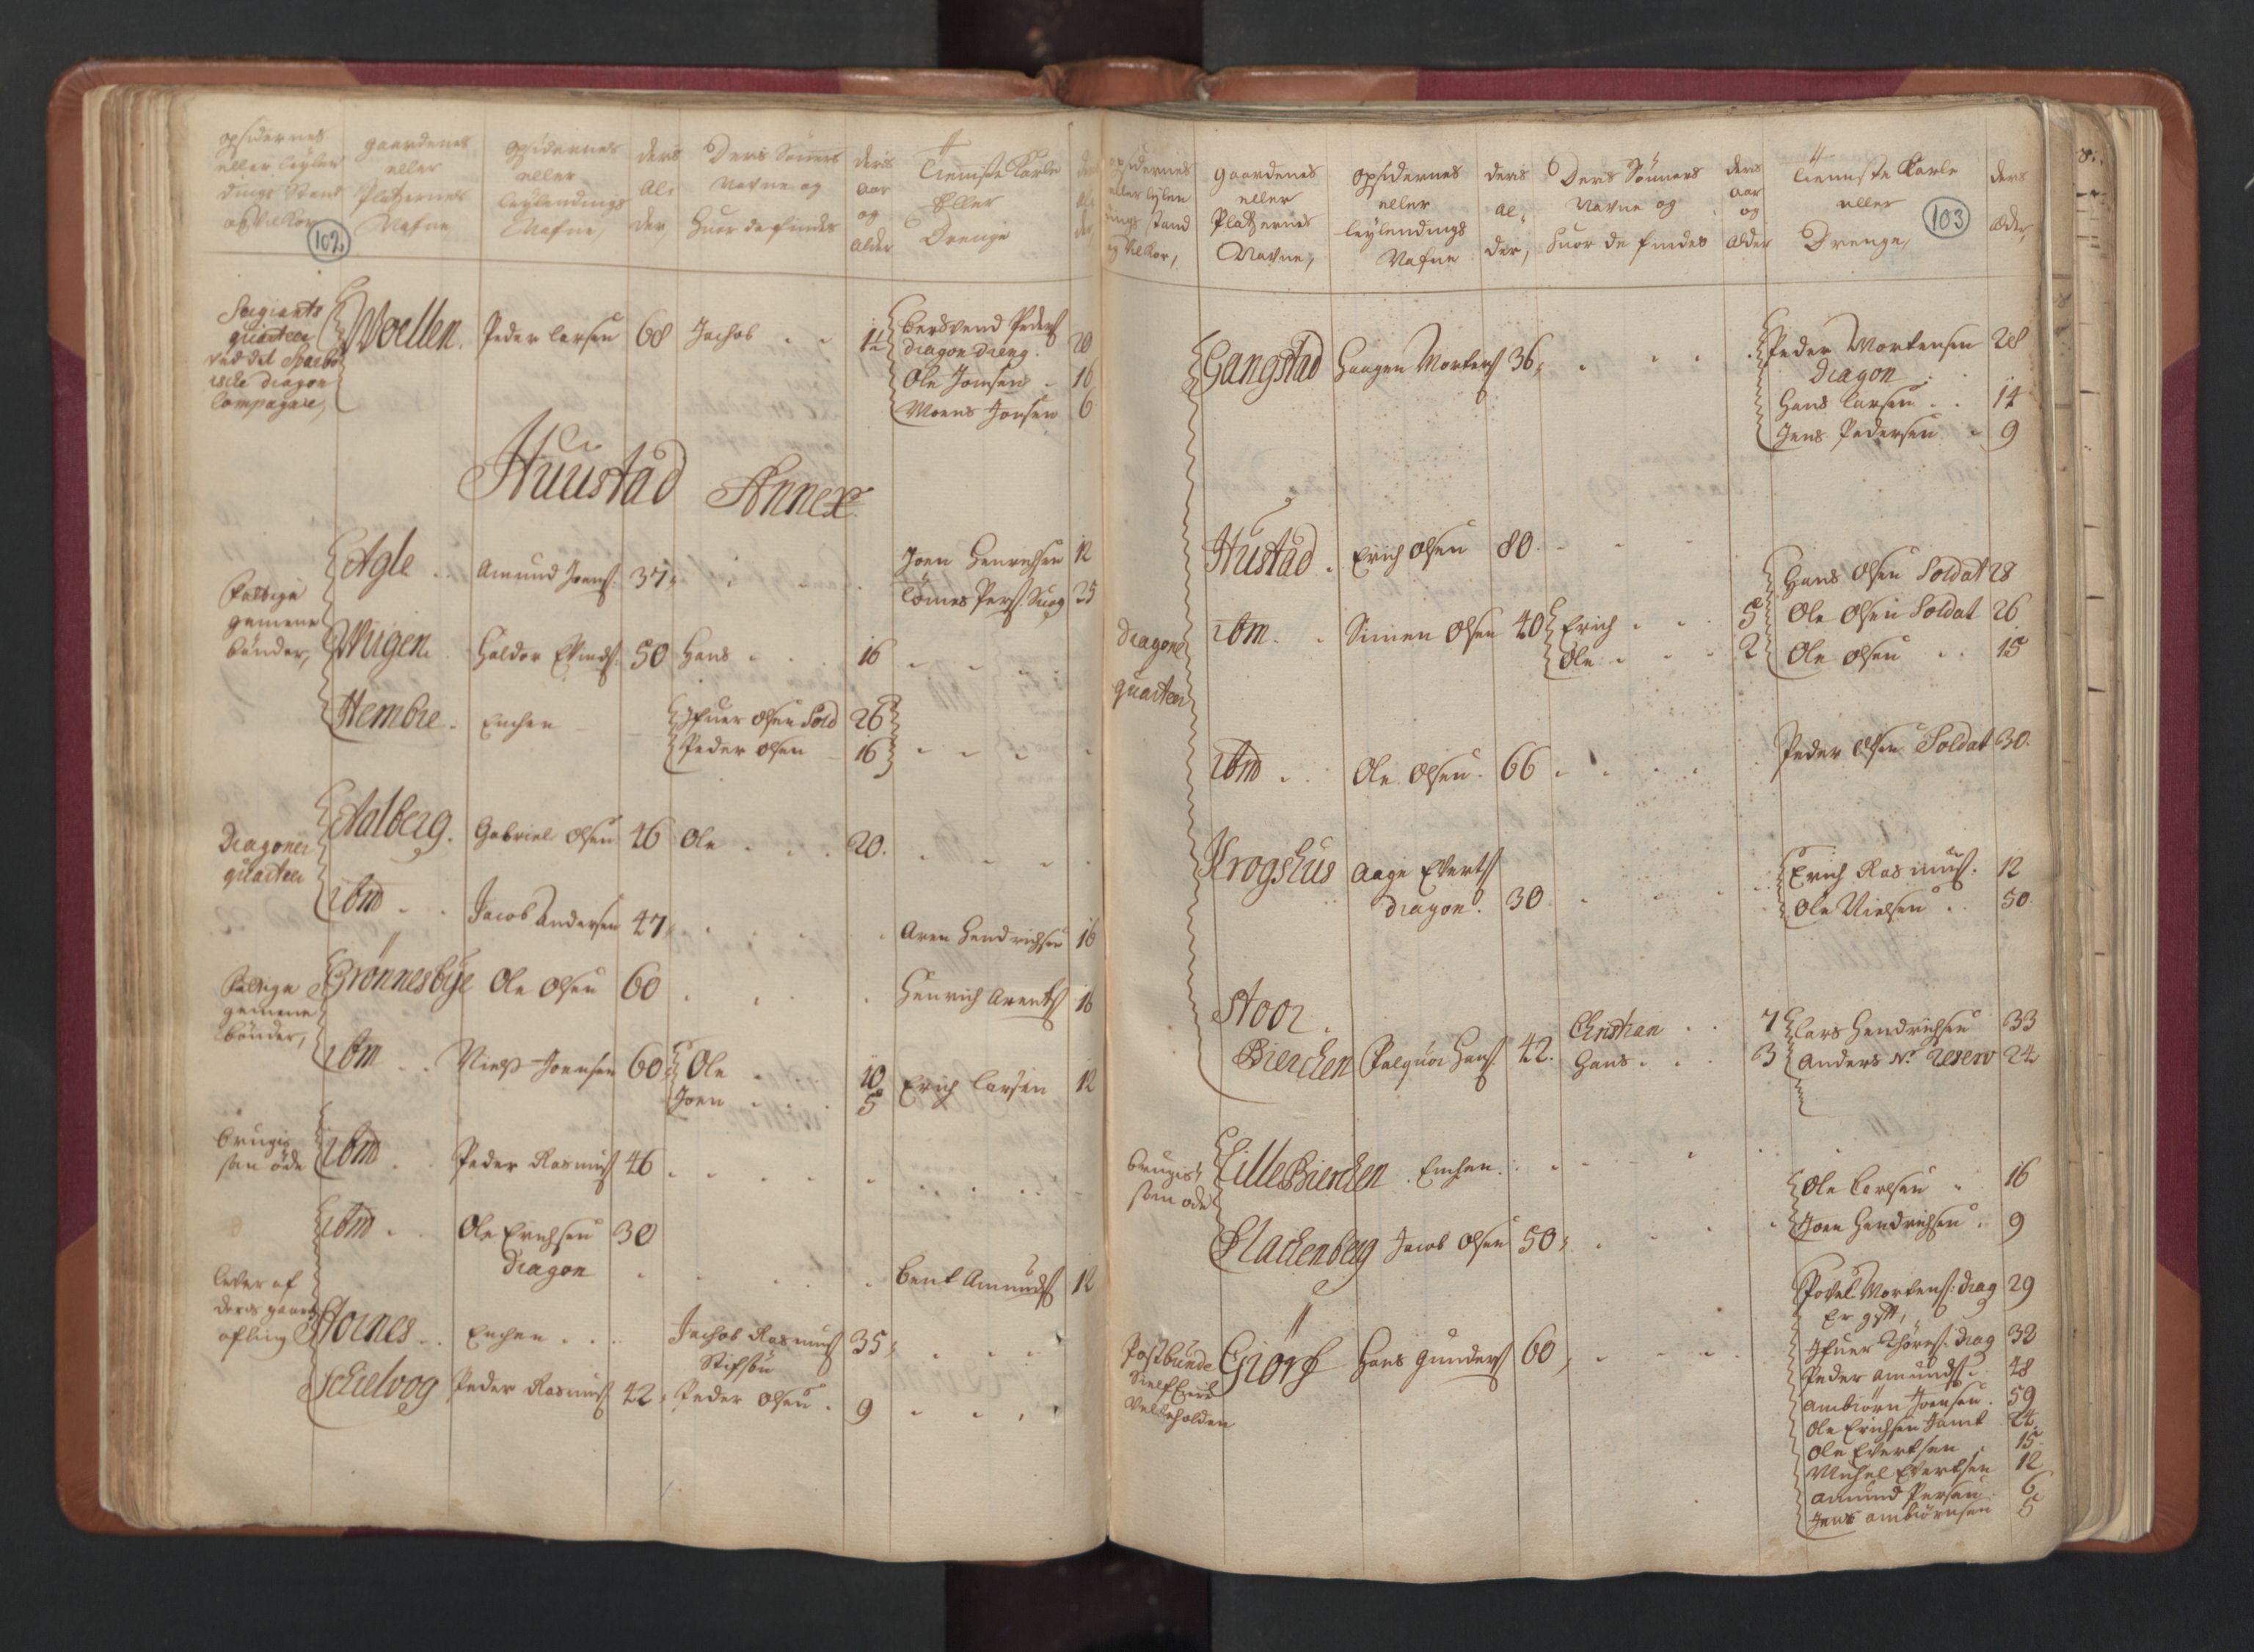 RA, Manntallet 1701, nr. 15: Inderøy fogderi og Namdal fogderi, 1701, s. 102-103